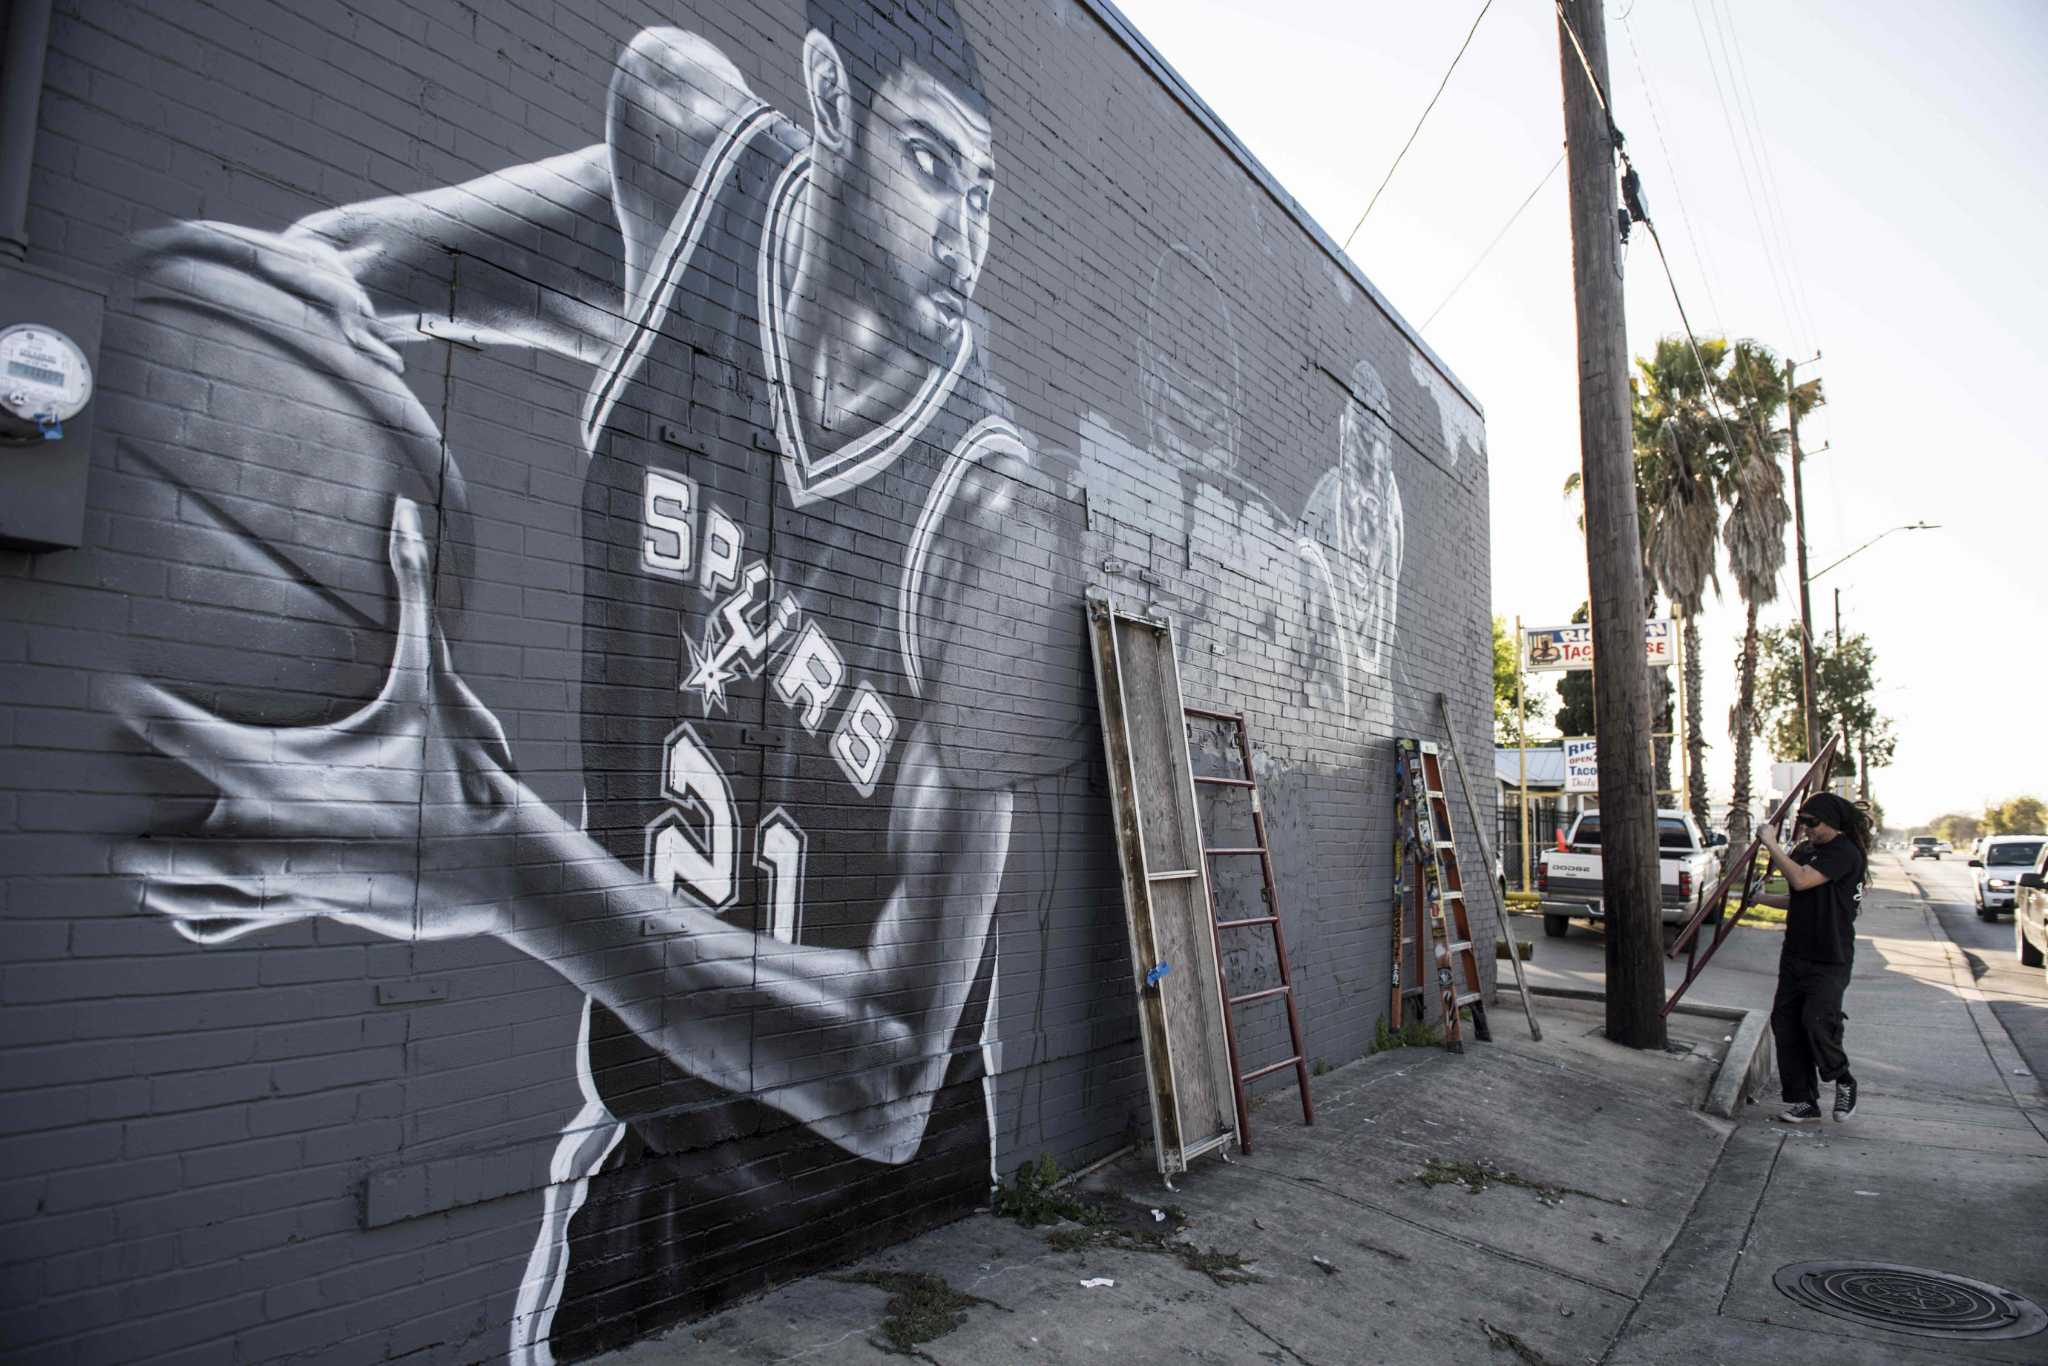 spurs graffiti murals a hit on south side expressnews com